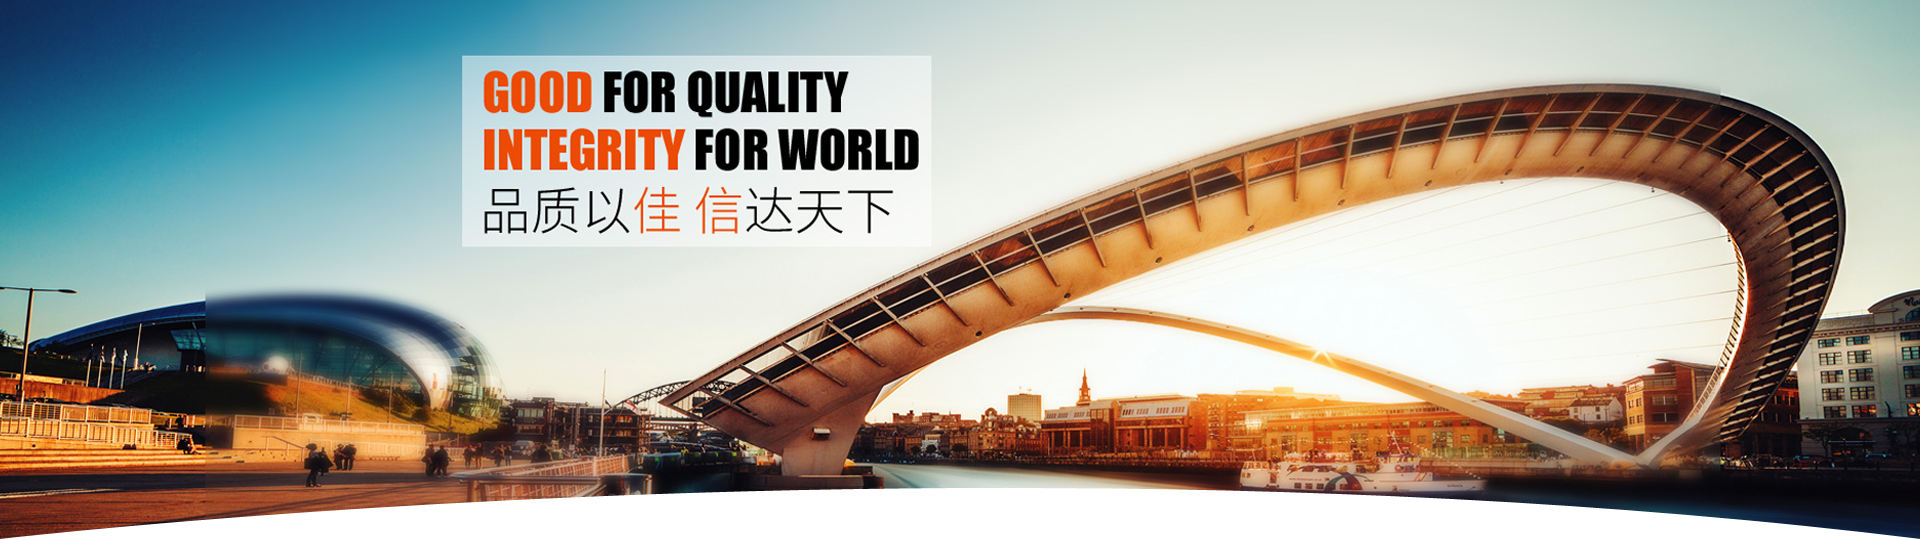 01 banner